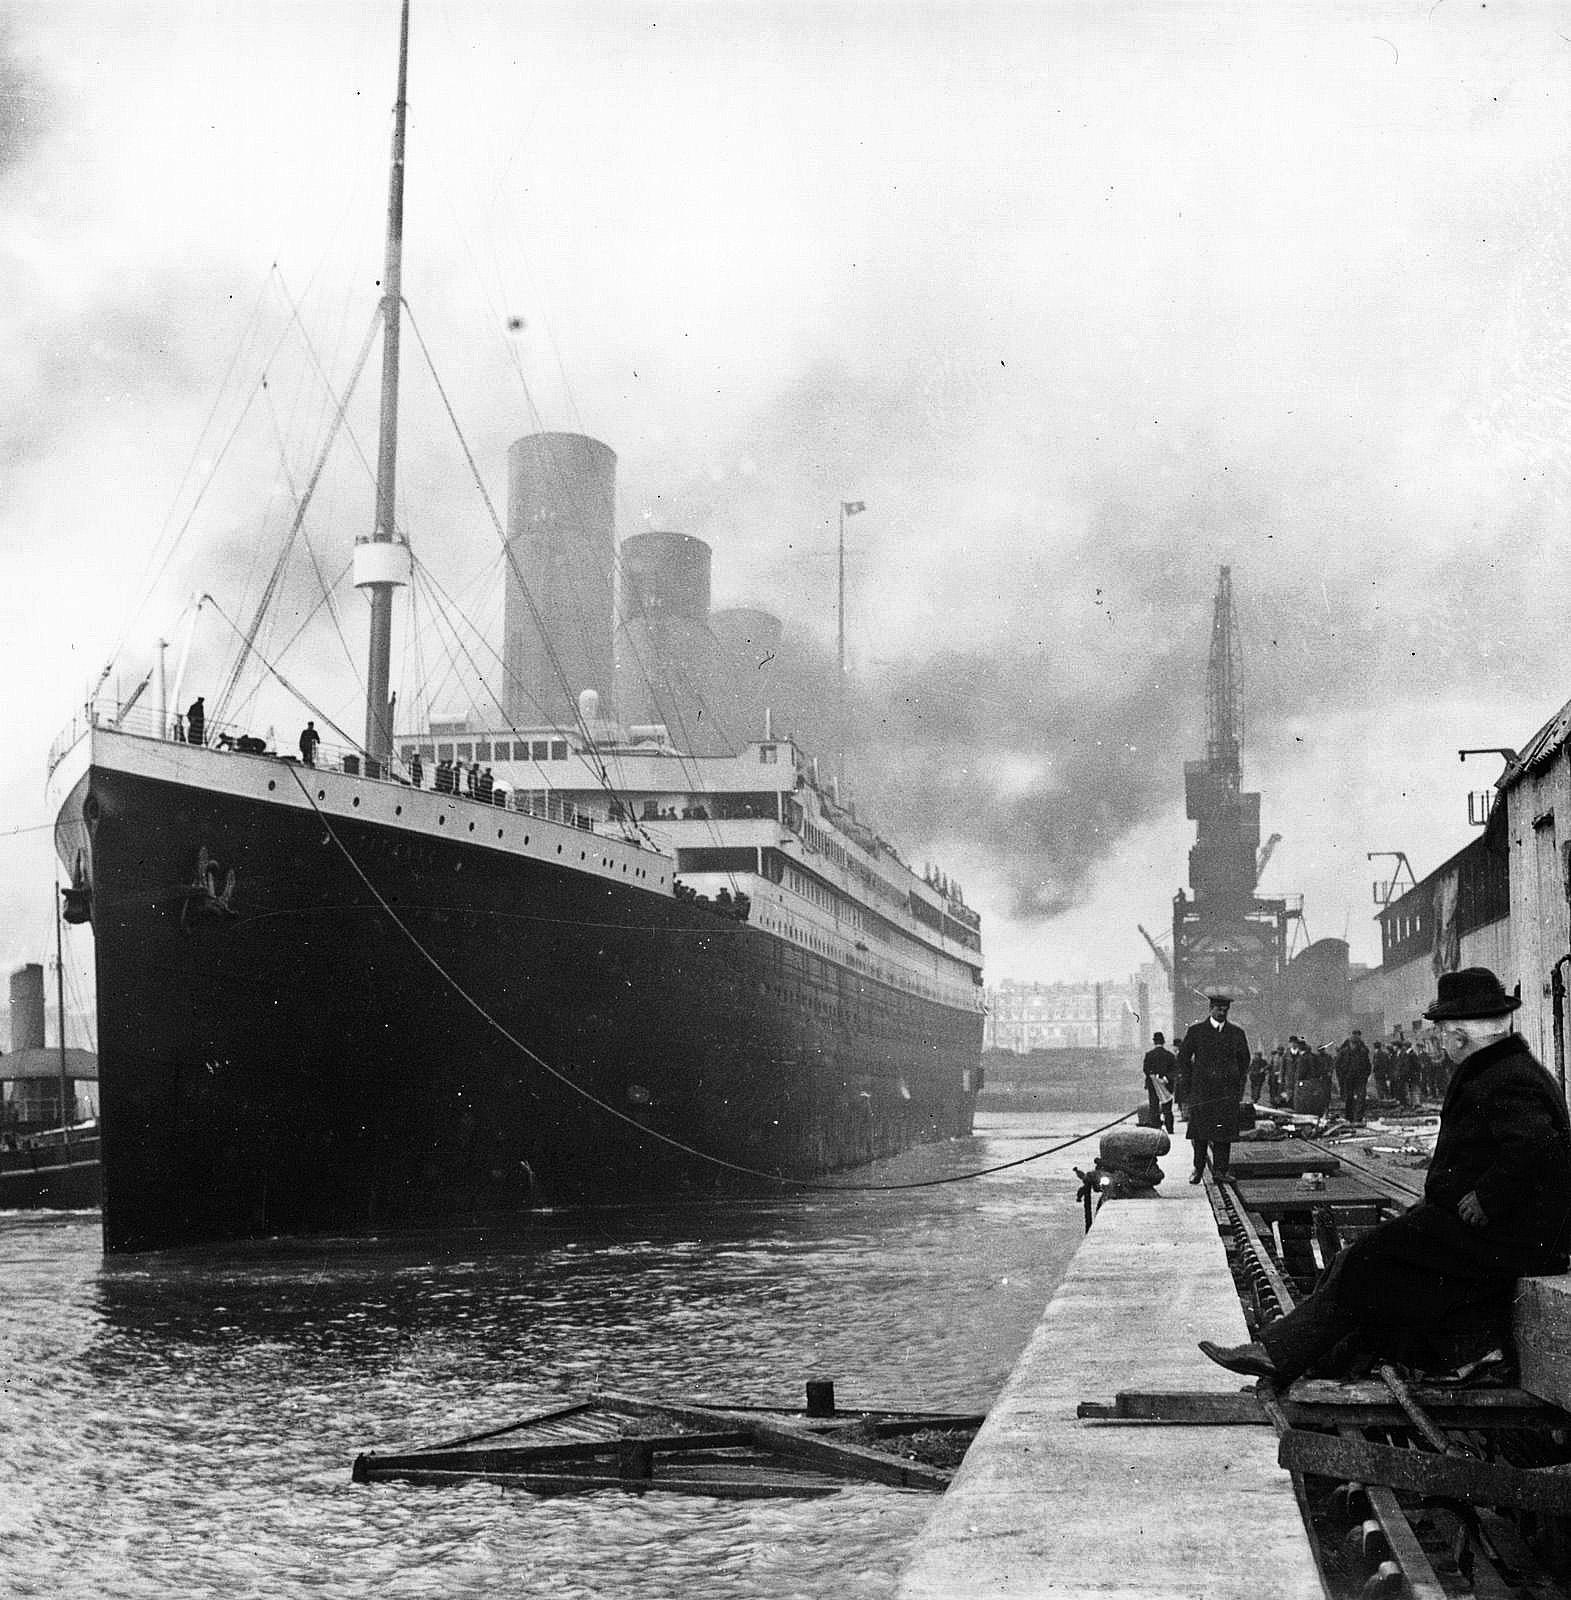 The Titanic in Dock